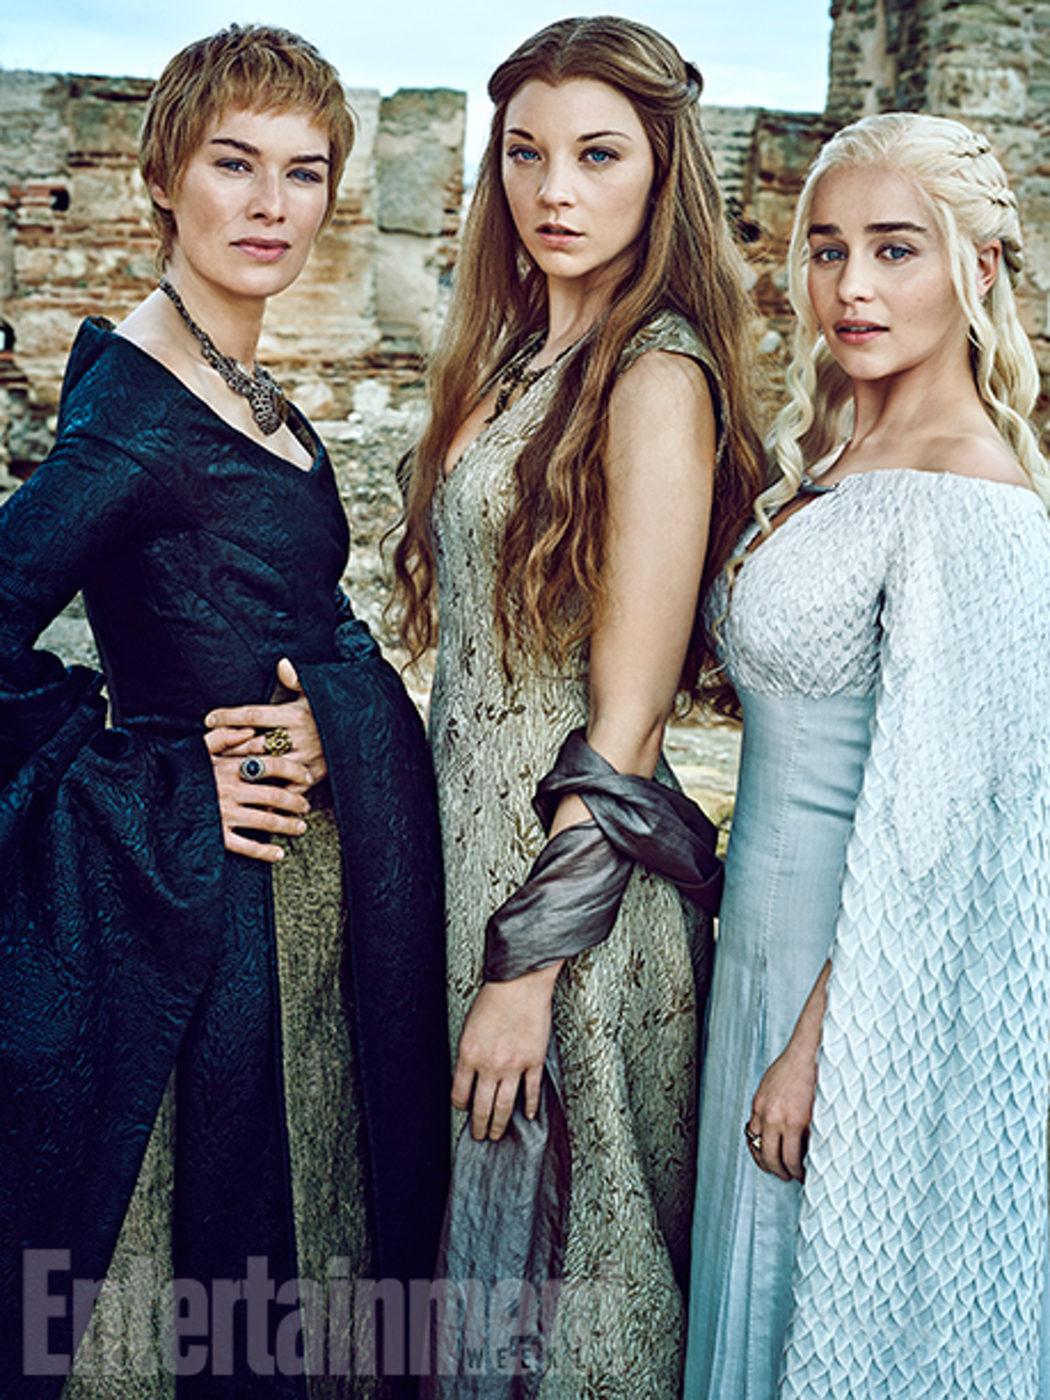 Lena Heady, Natalie Dormer y Emilia Clarke posan juntas para Entertainment Weekly